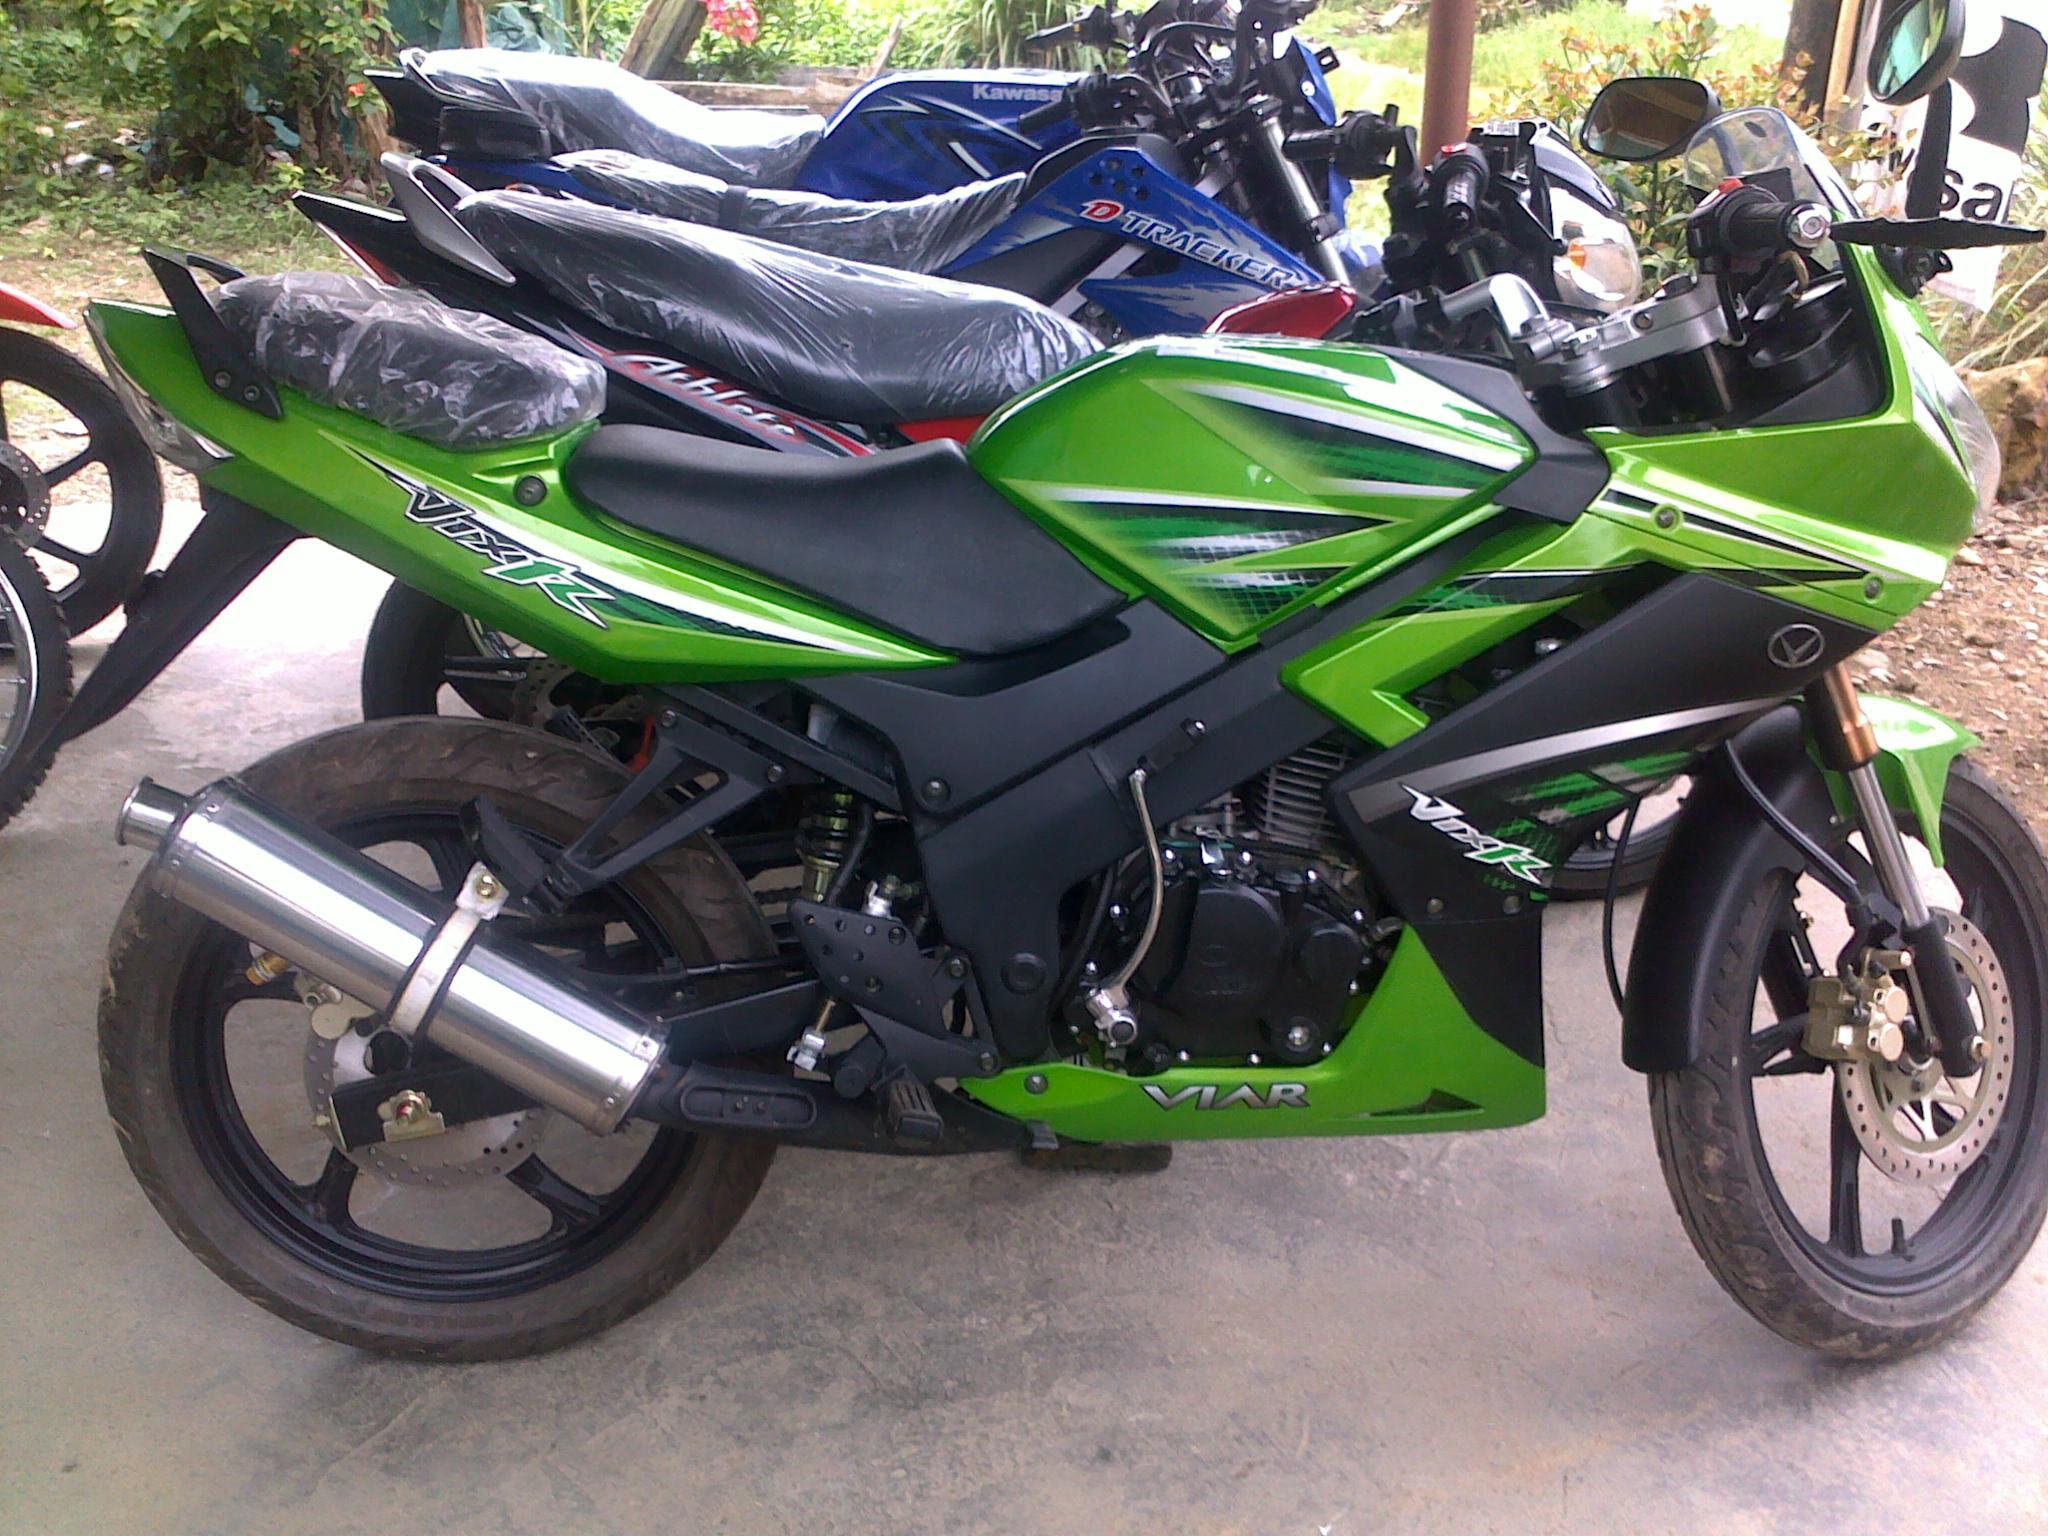 99 Gambar Motor Ninja 4 Tak 150cc Terbaru Dan Terlengkap Obeng Motor